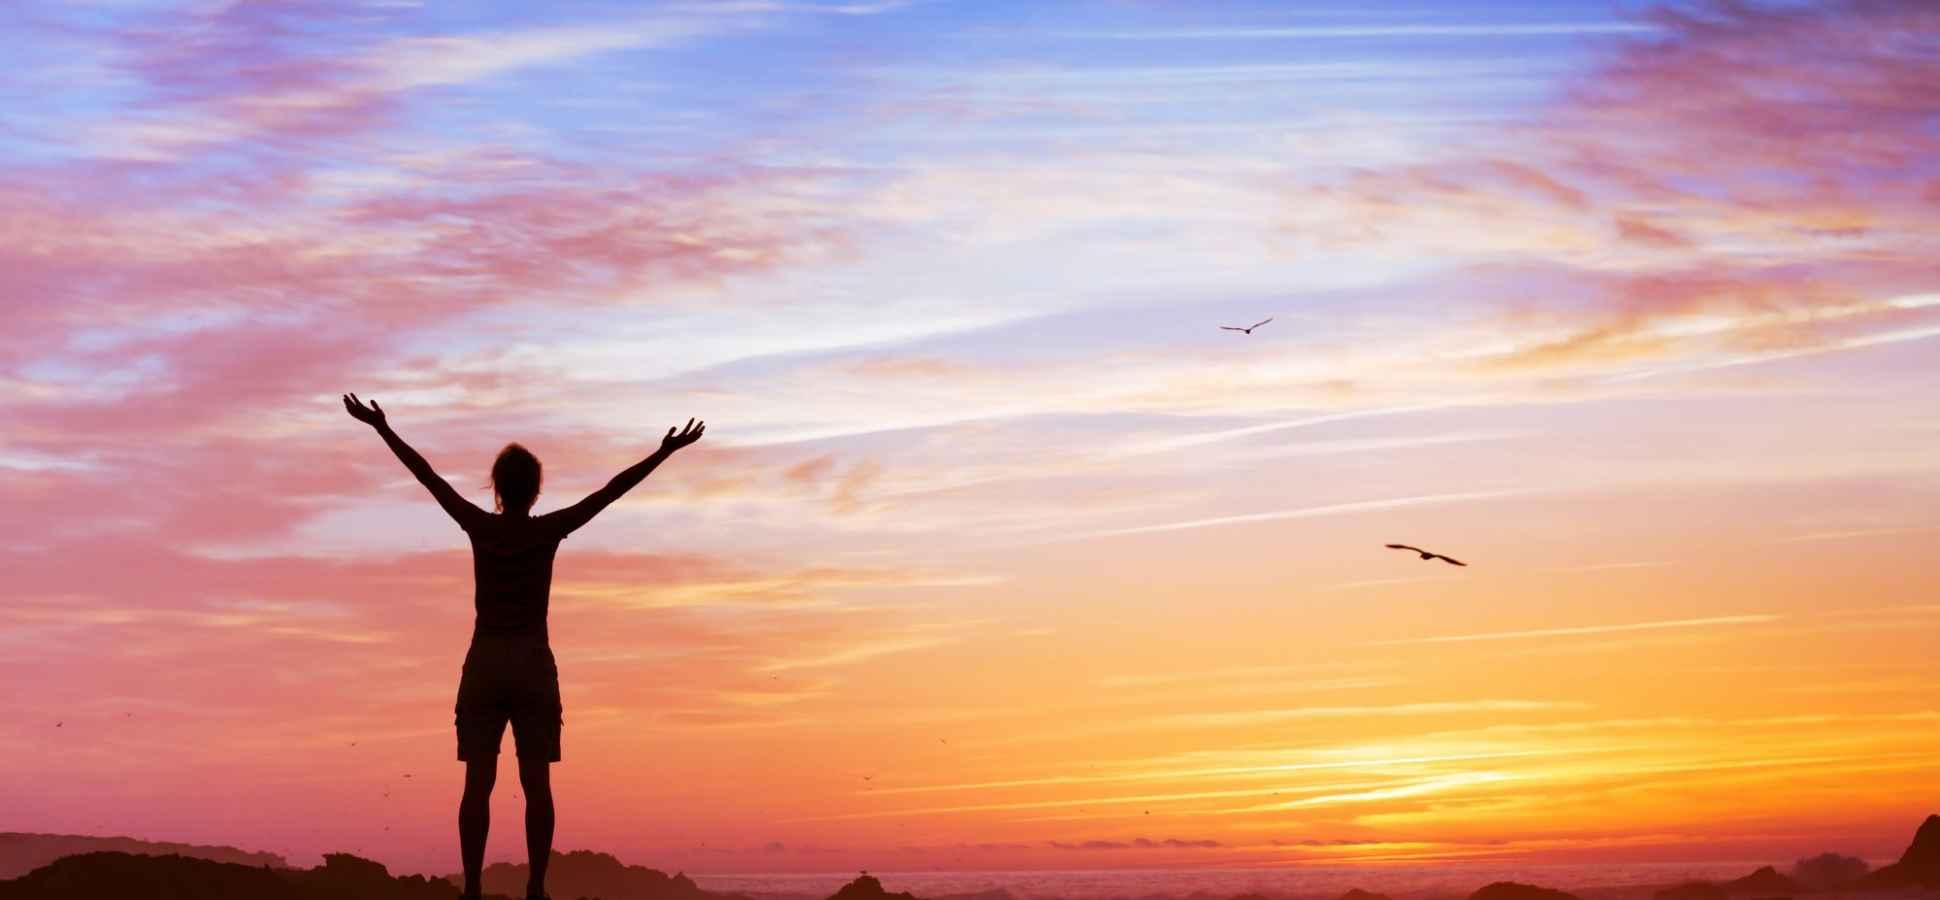 7 Ways to Reboot & Create More Joy